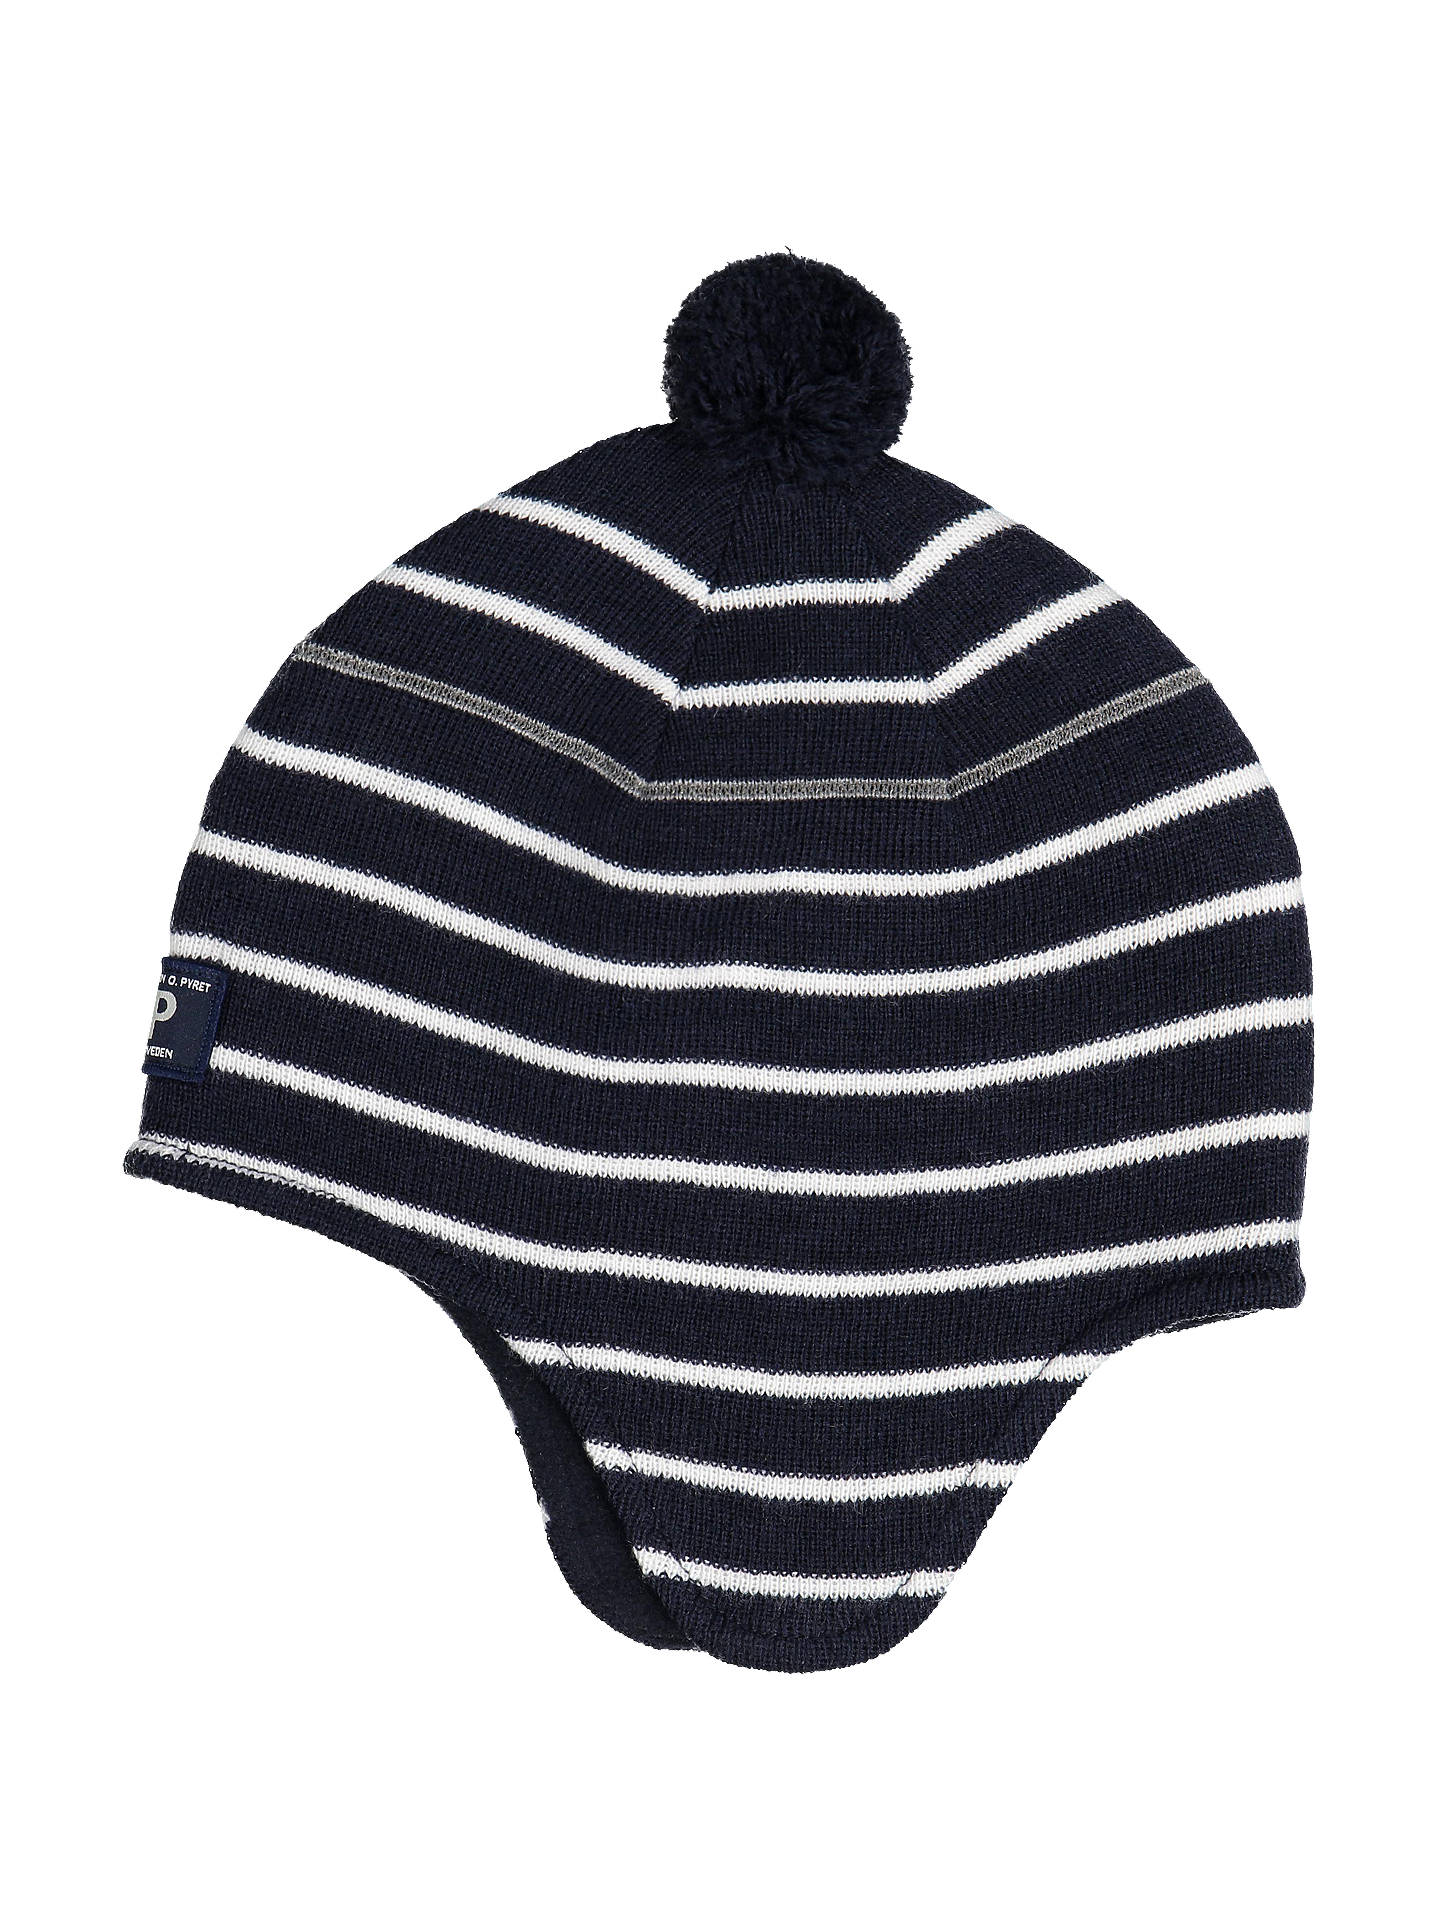 aa417b1c6ef446 BuyPolarn O. Pyret Children s Stripe Hat